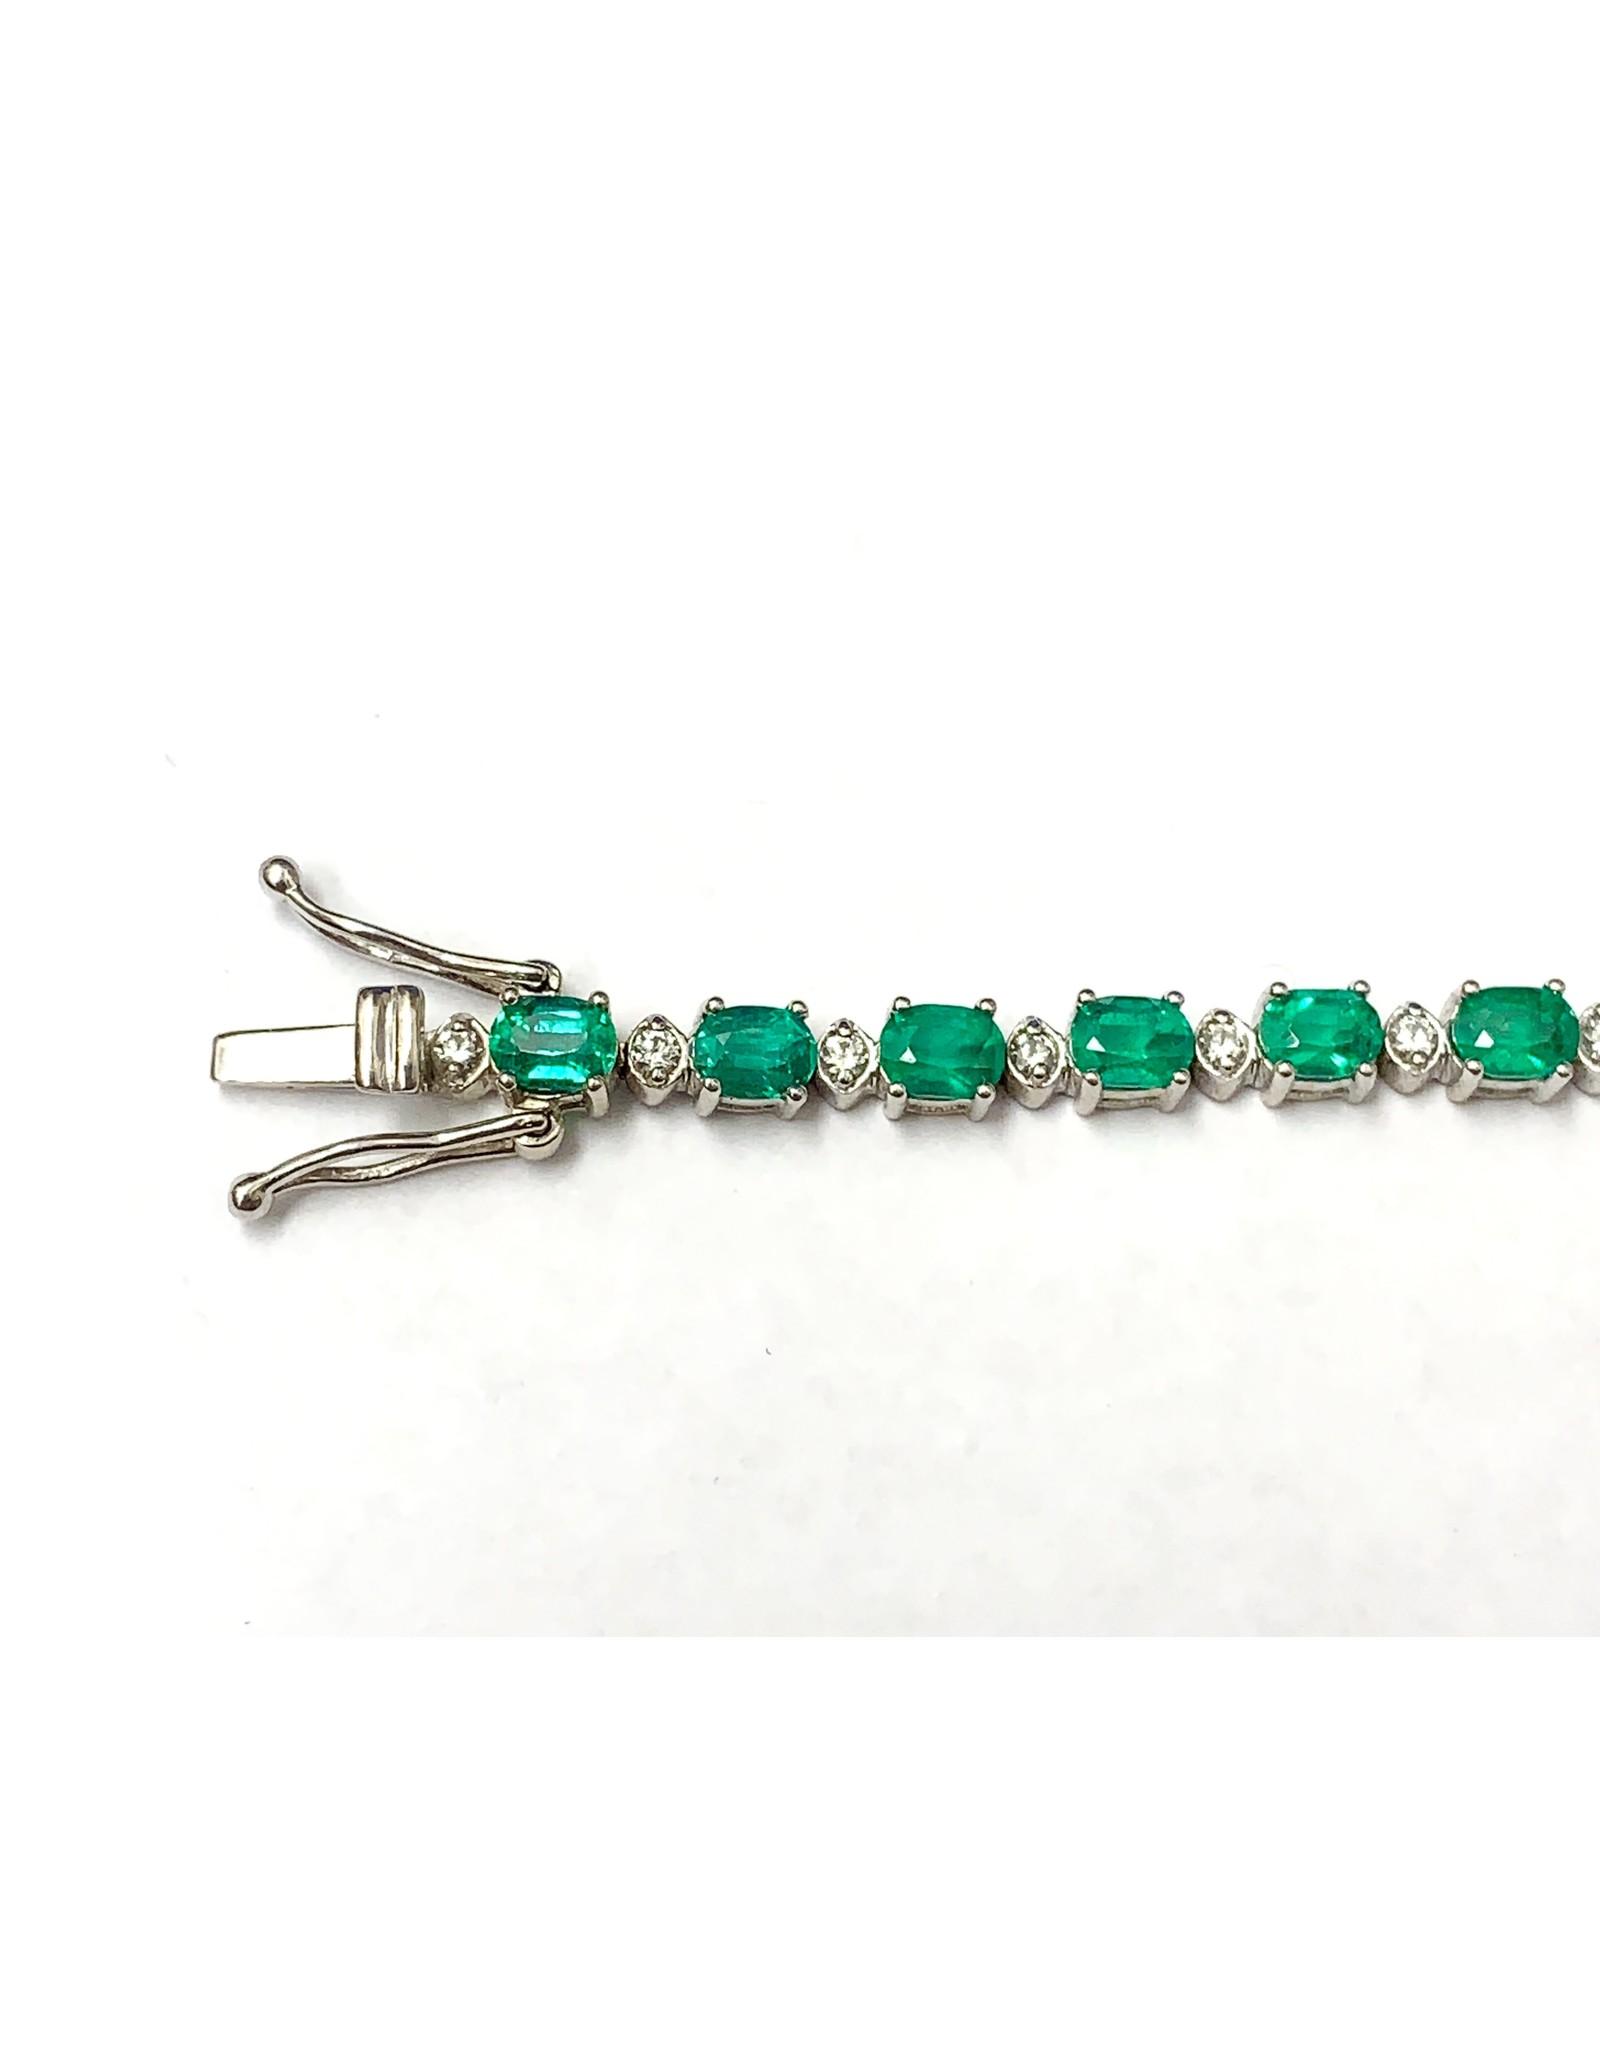 Emerald & Diamond Bracelet 18KW